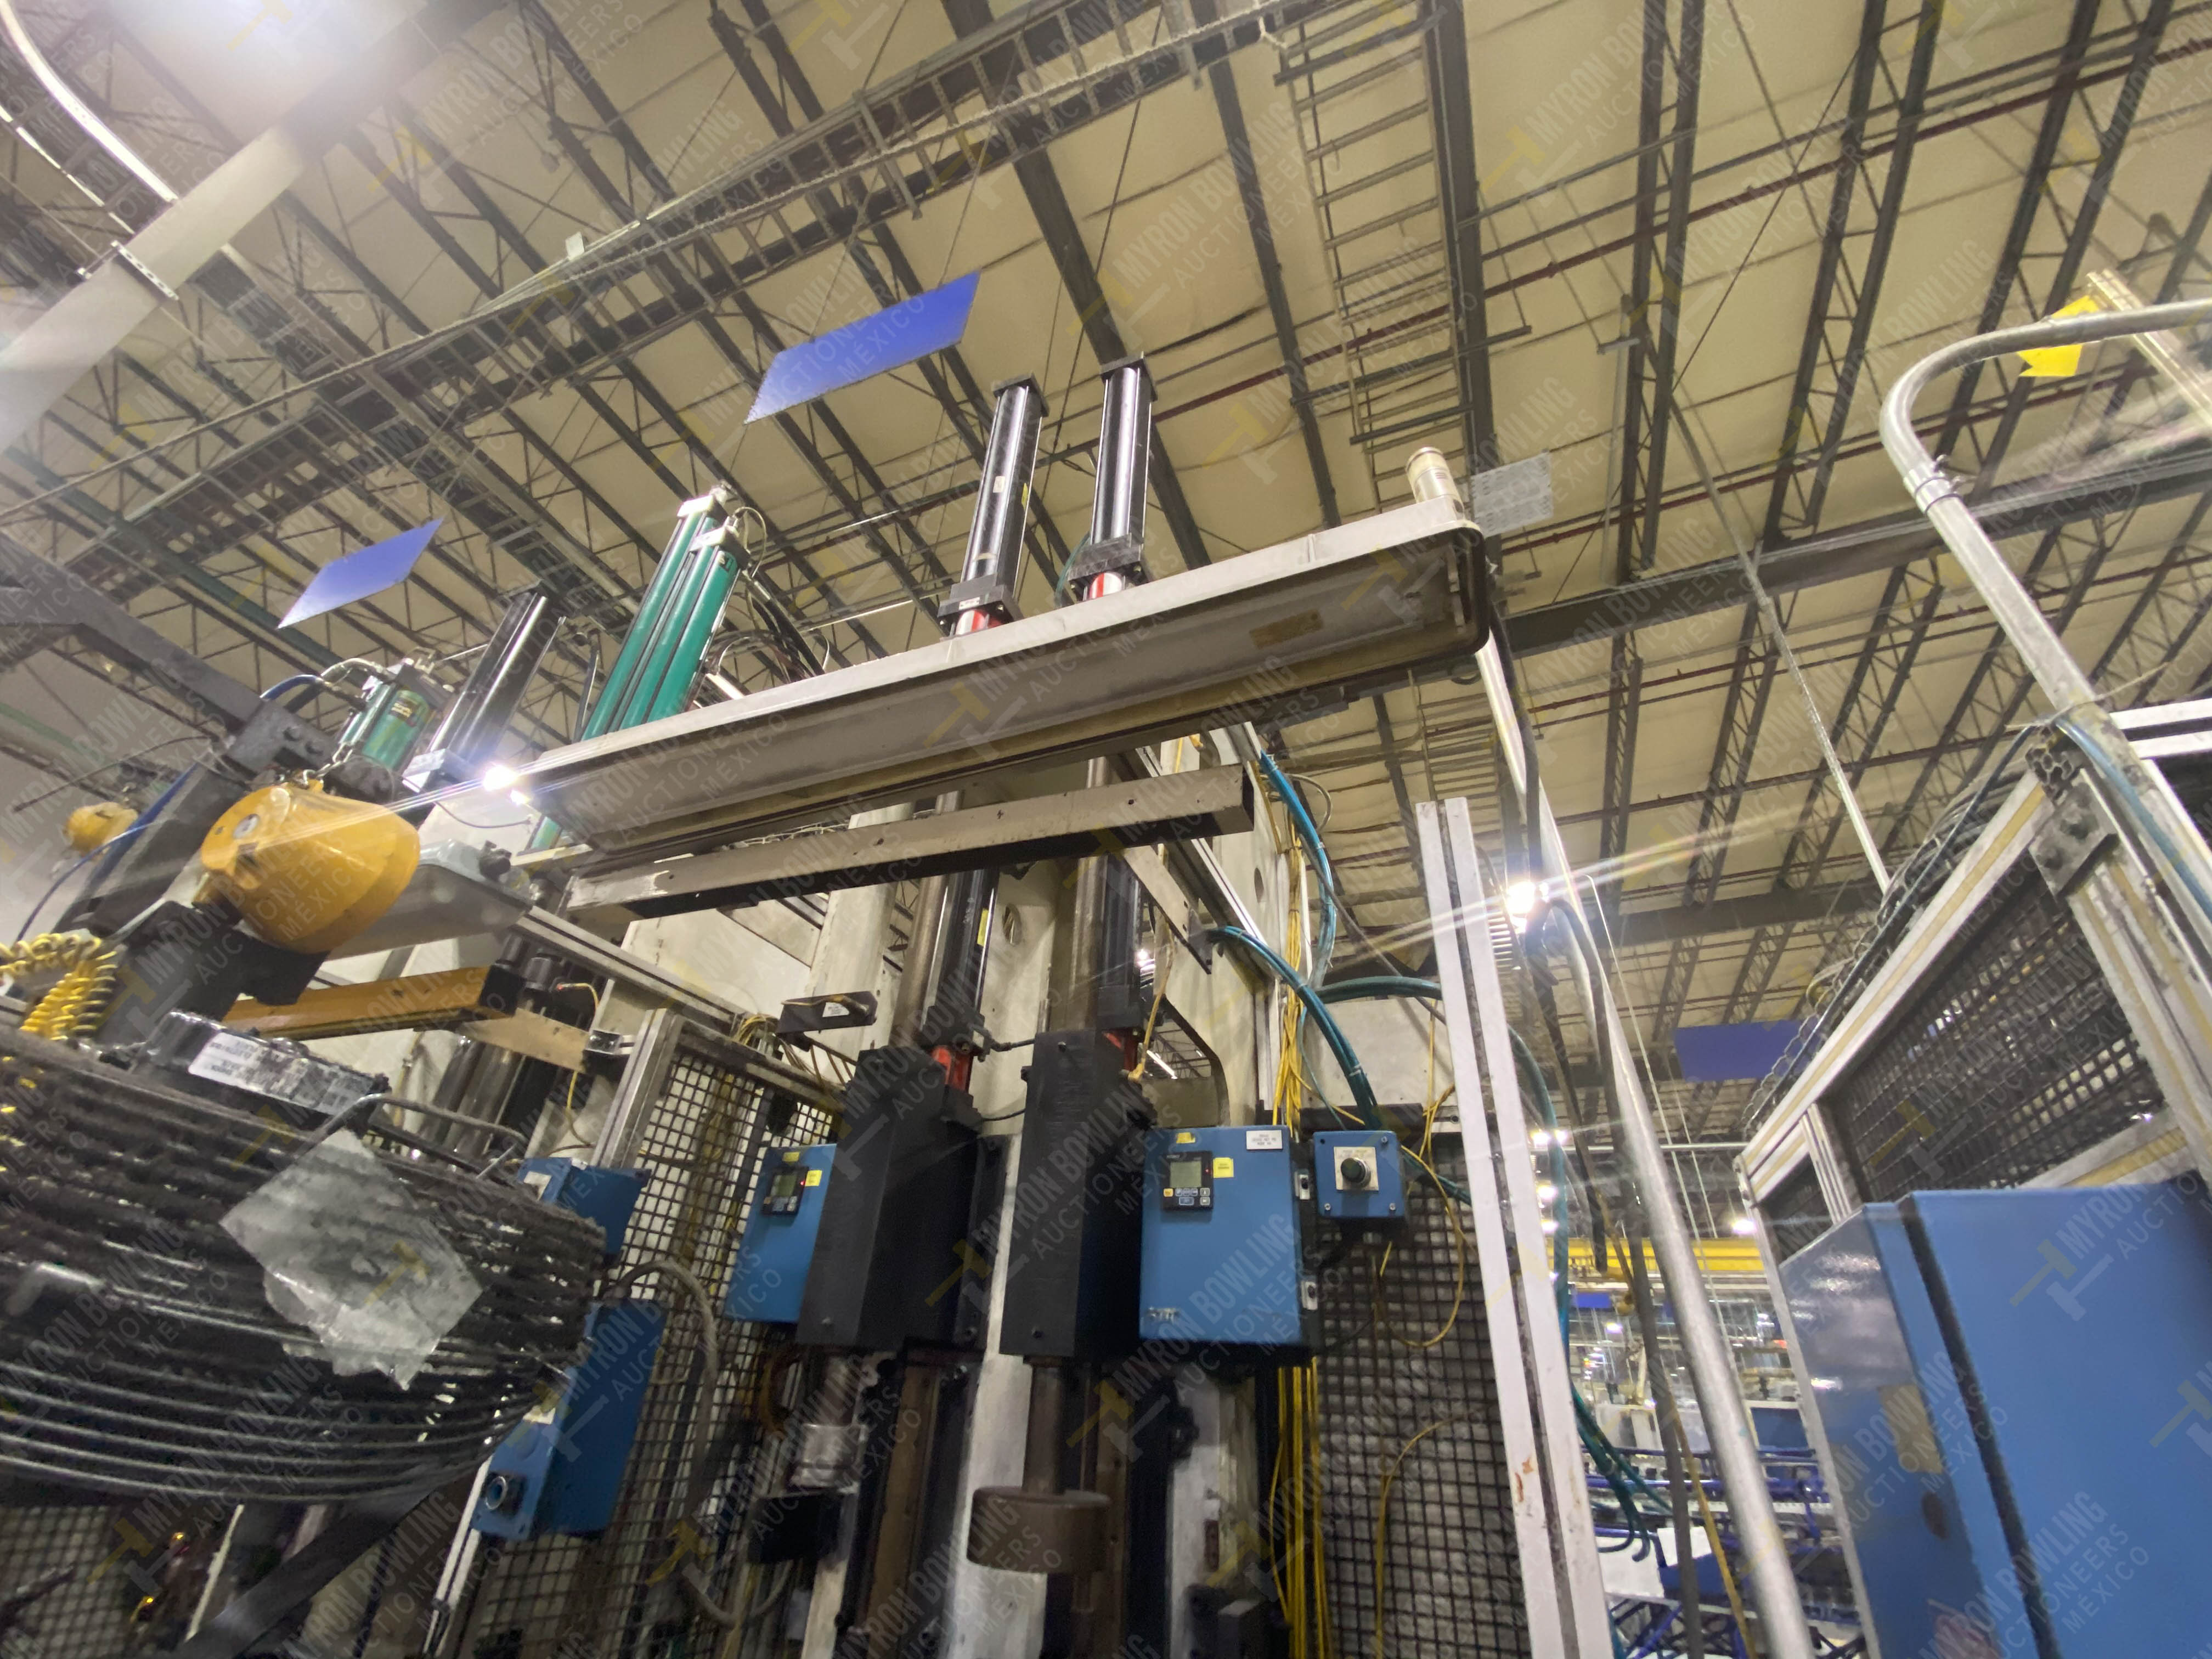 Estación semiautomática para operación 305D, contiene: Prensa tipo cuello de ganso con dos cilindros - Image 5 of 20